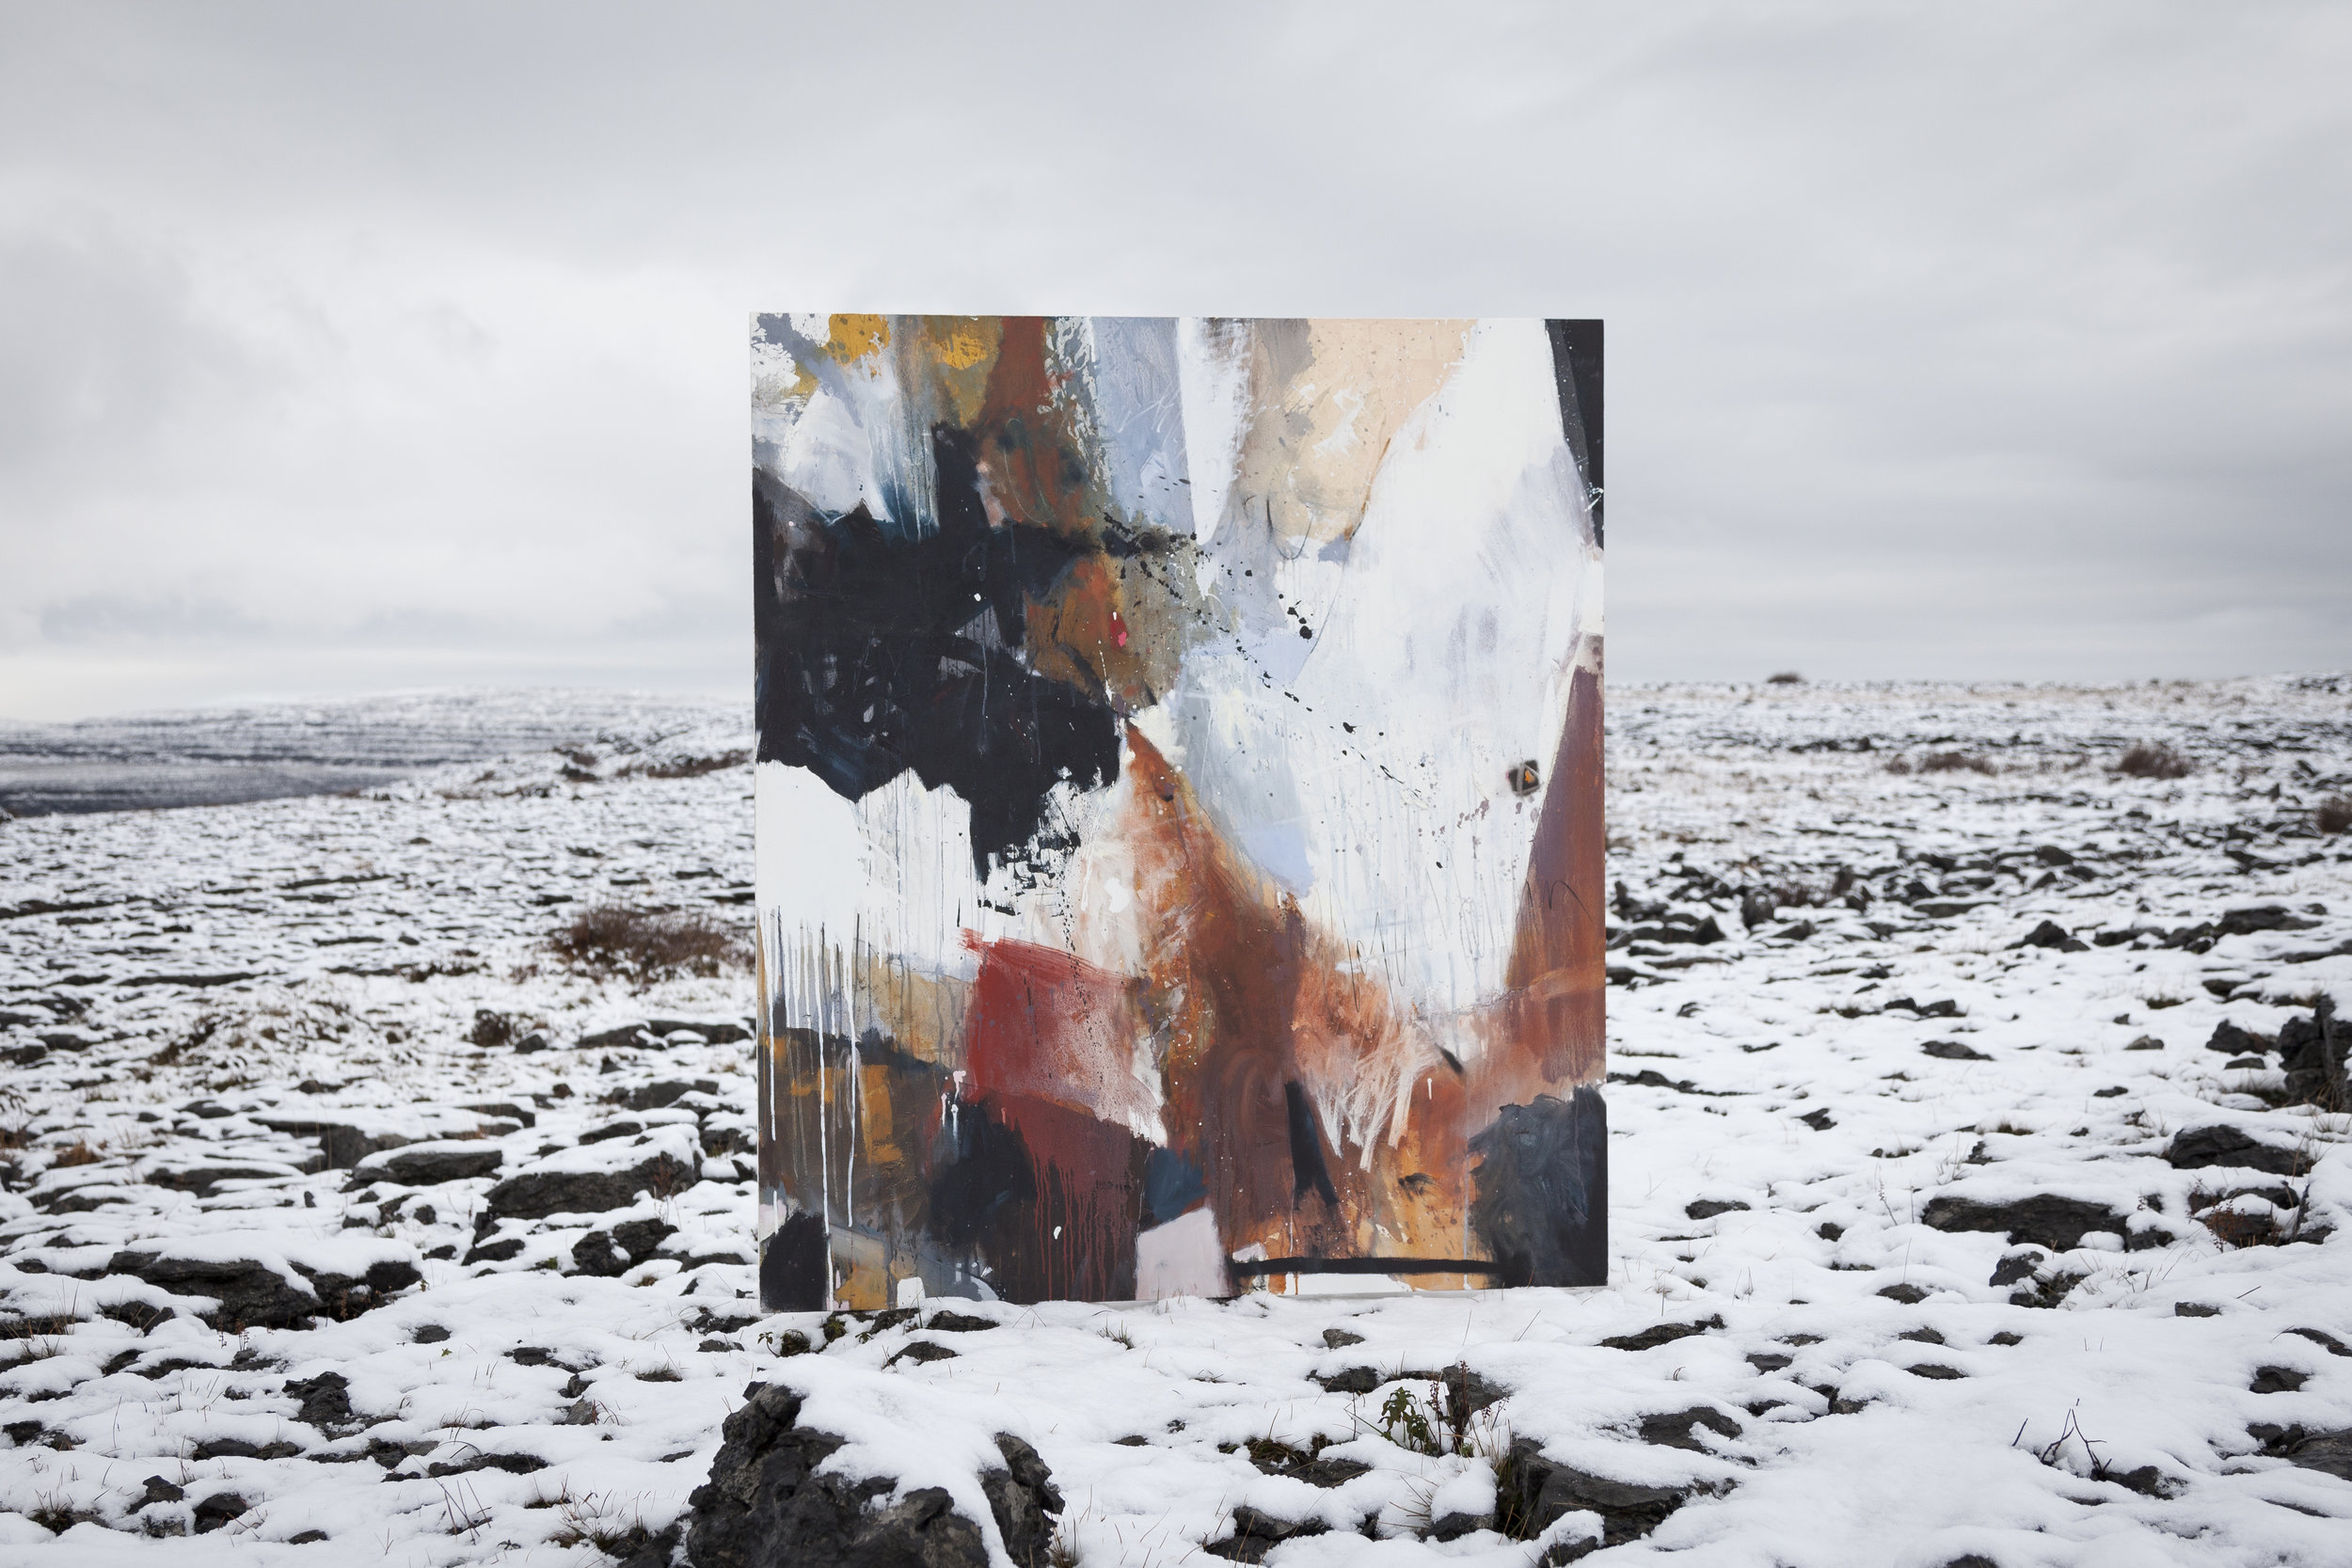 Pegasus by Richard Hearns - oil on canvas - 160x140cm - 16,000euro.jpg